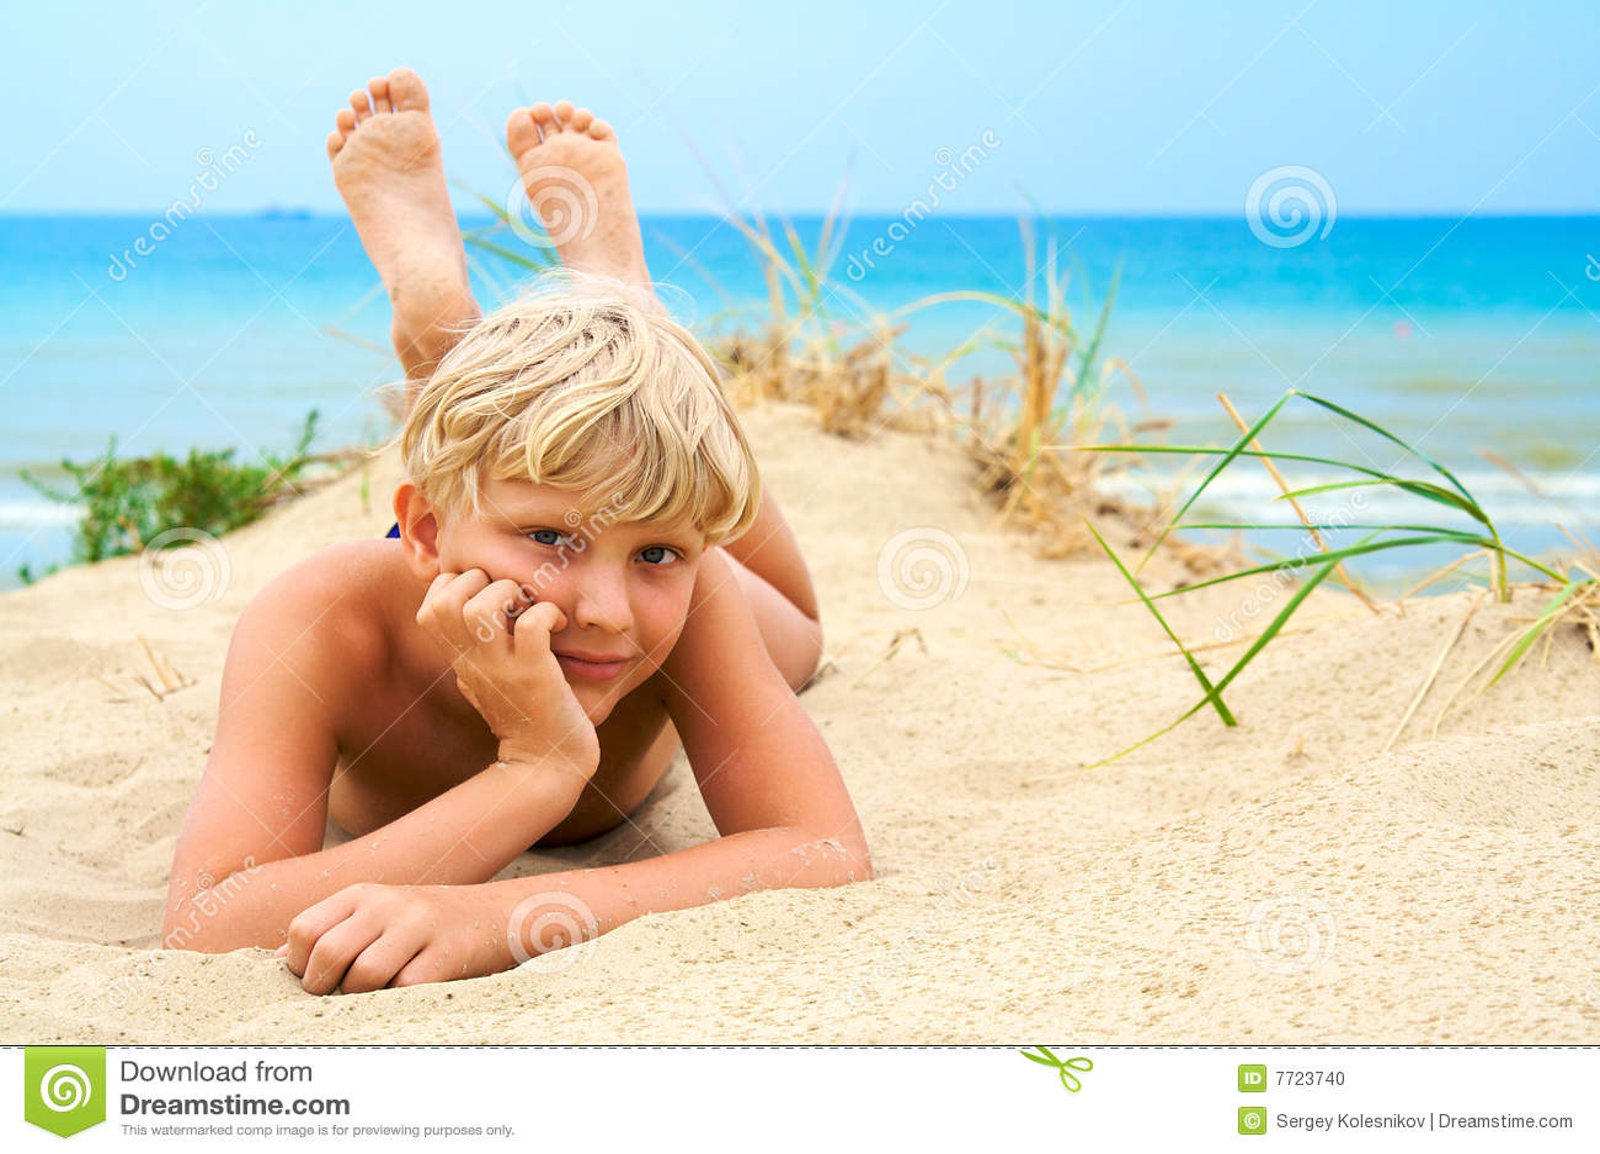 Дрочун на пляже 233